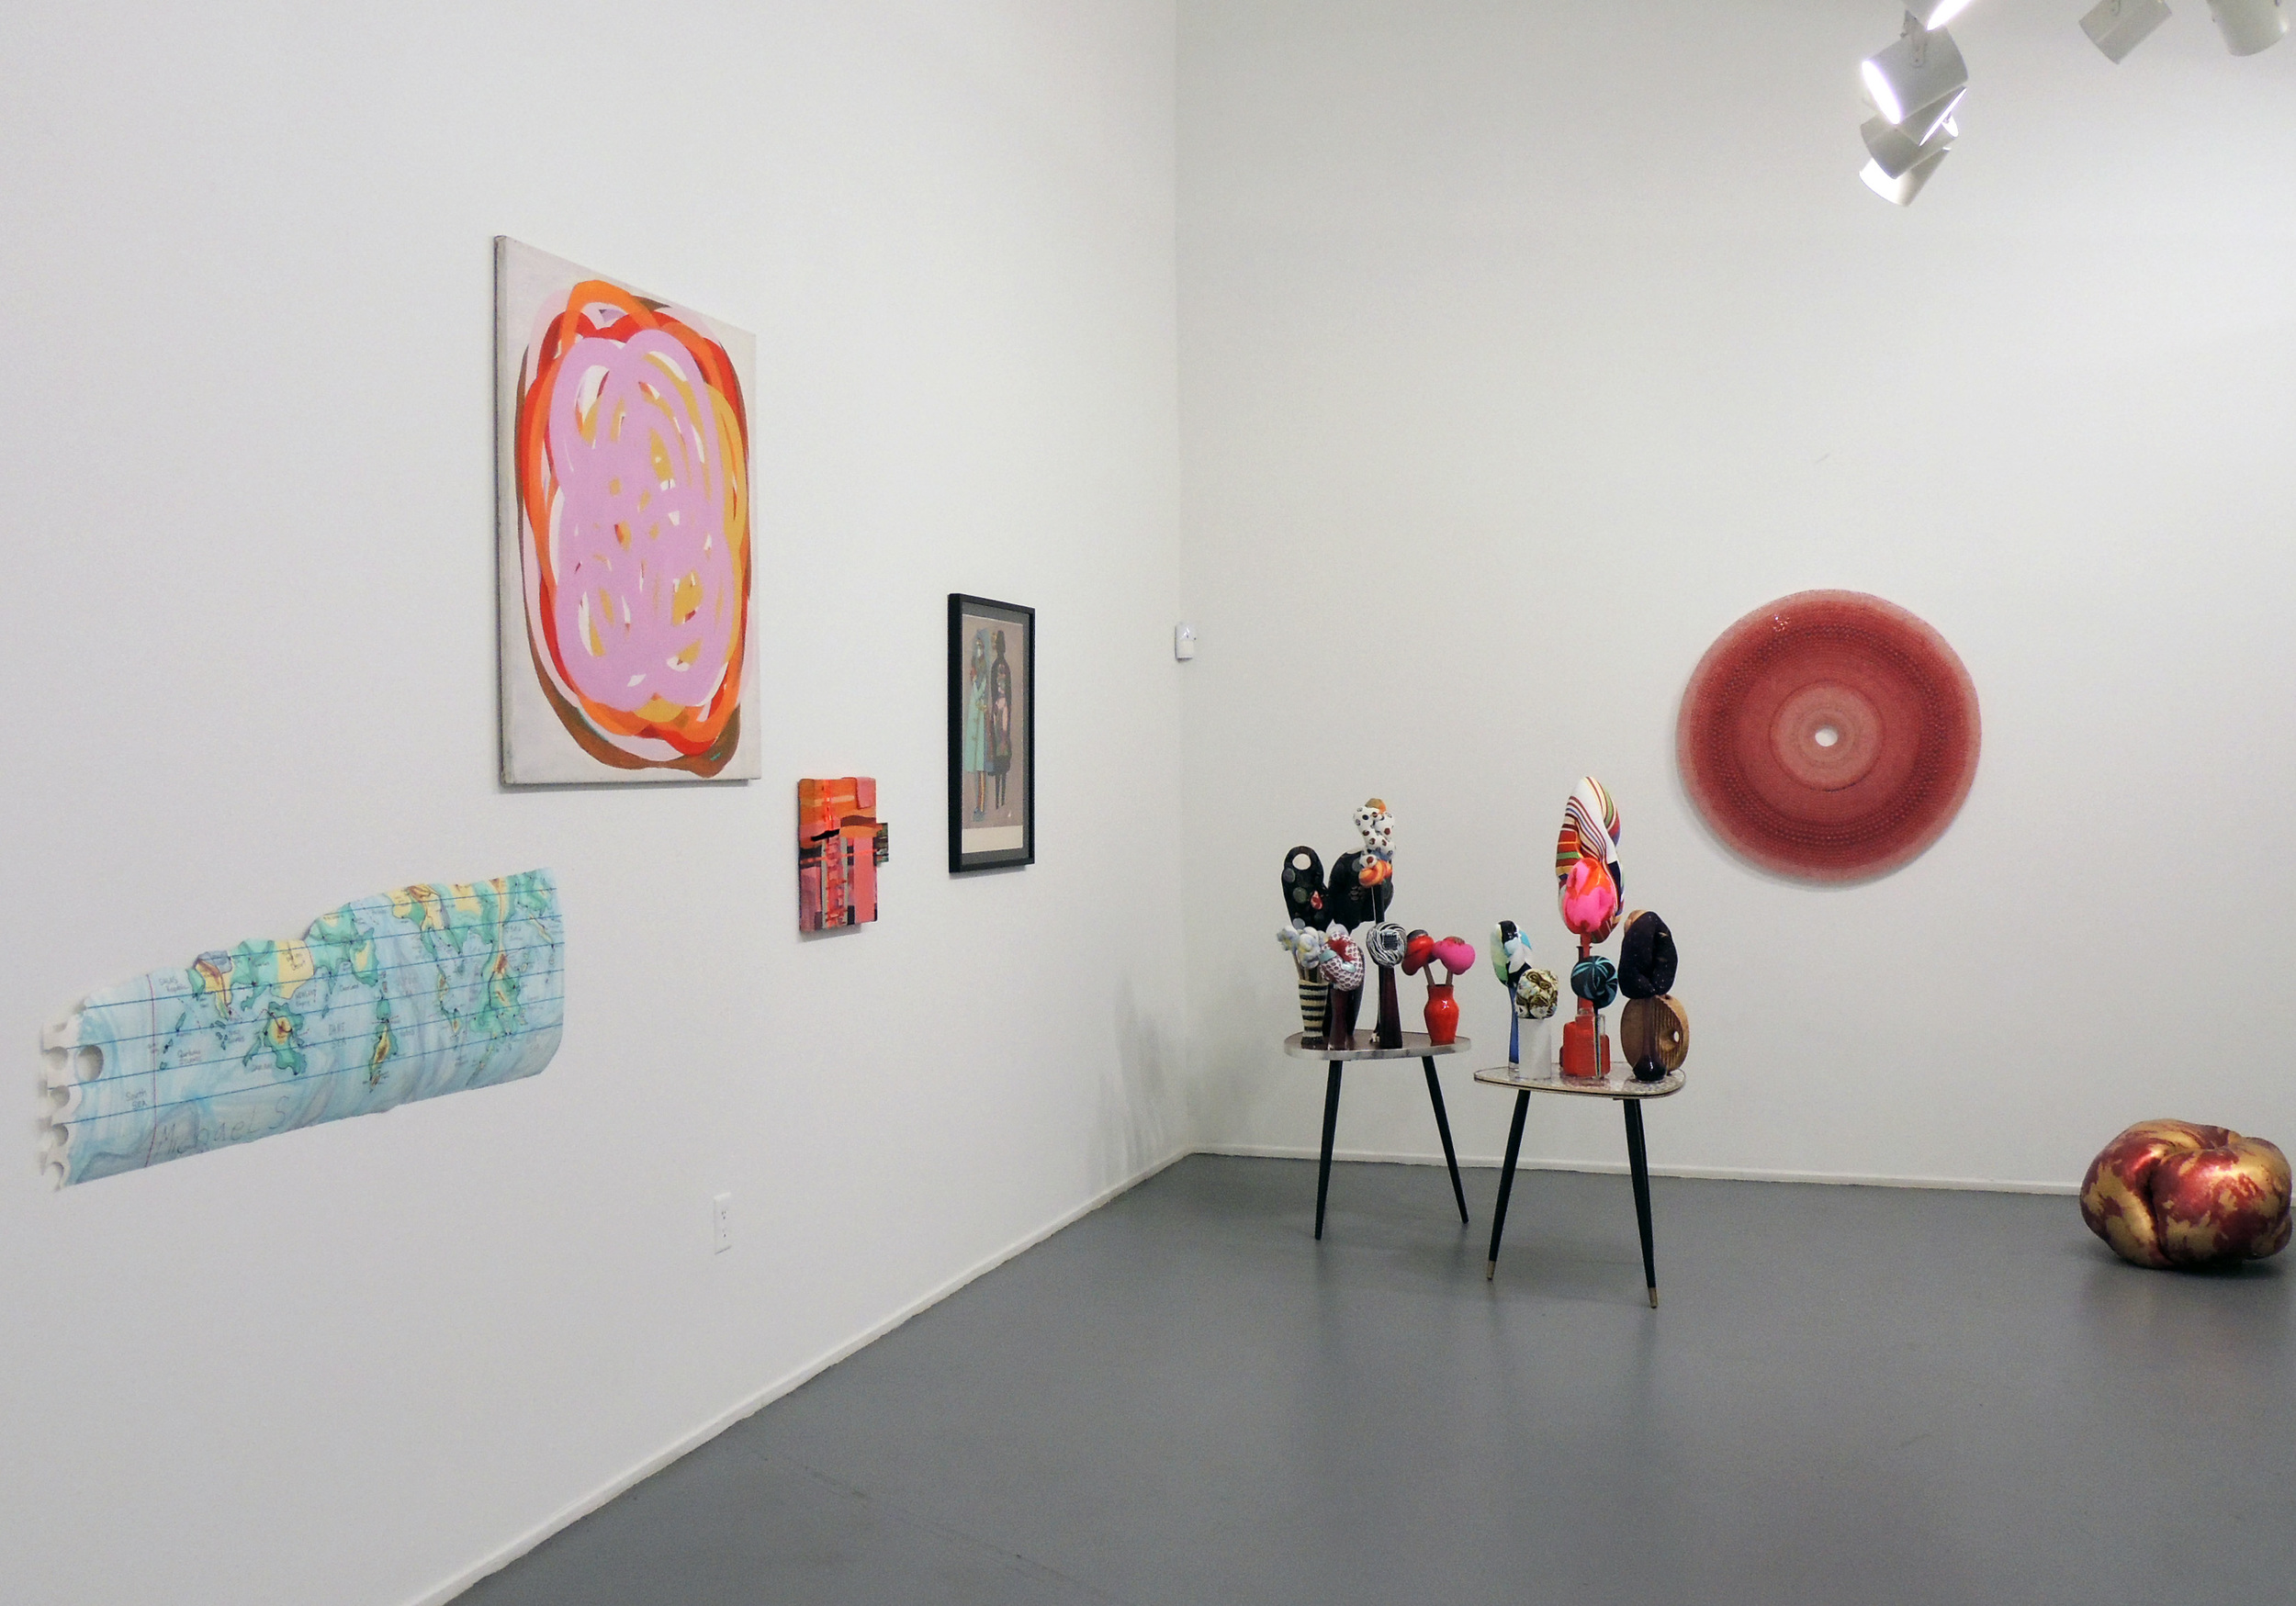 From left: Scoggins, De Sagastizabal, Labin, Wolsky